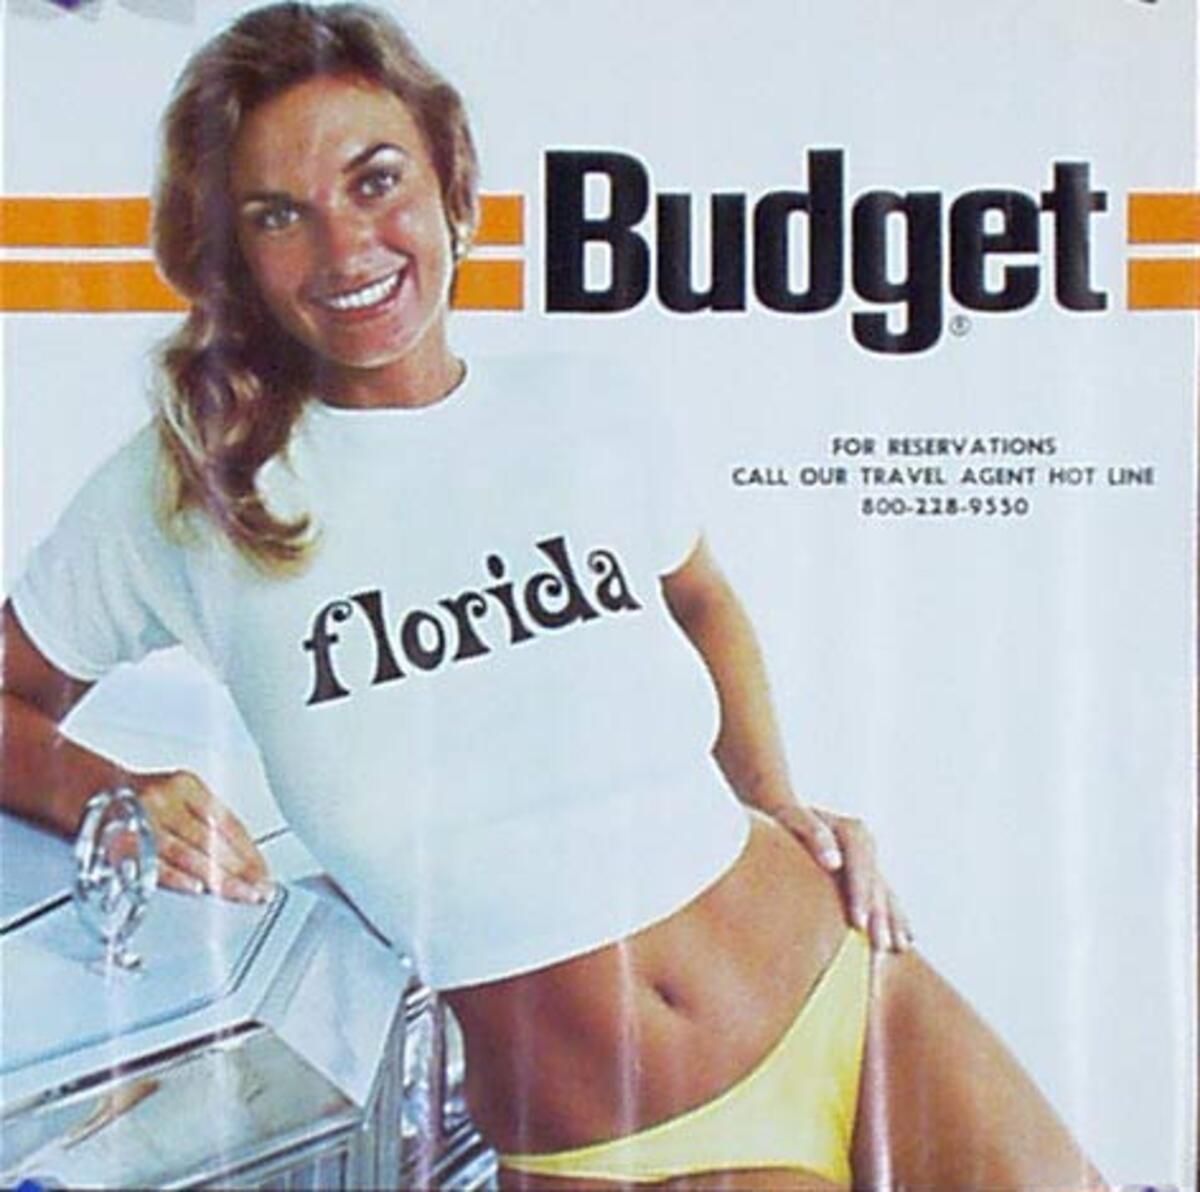 Budget Car Rental Original Advertising Poster